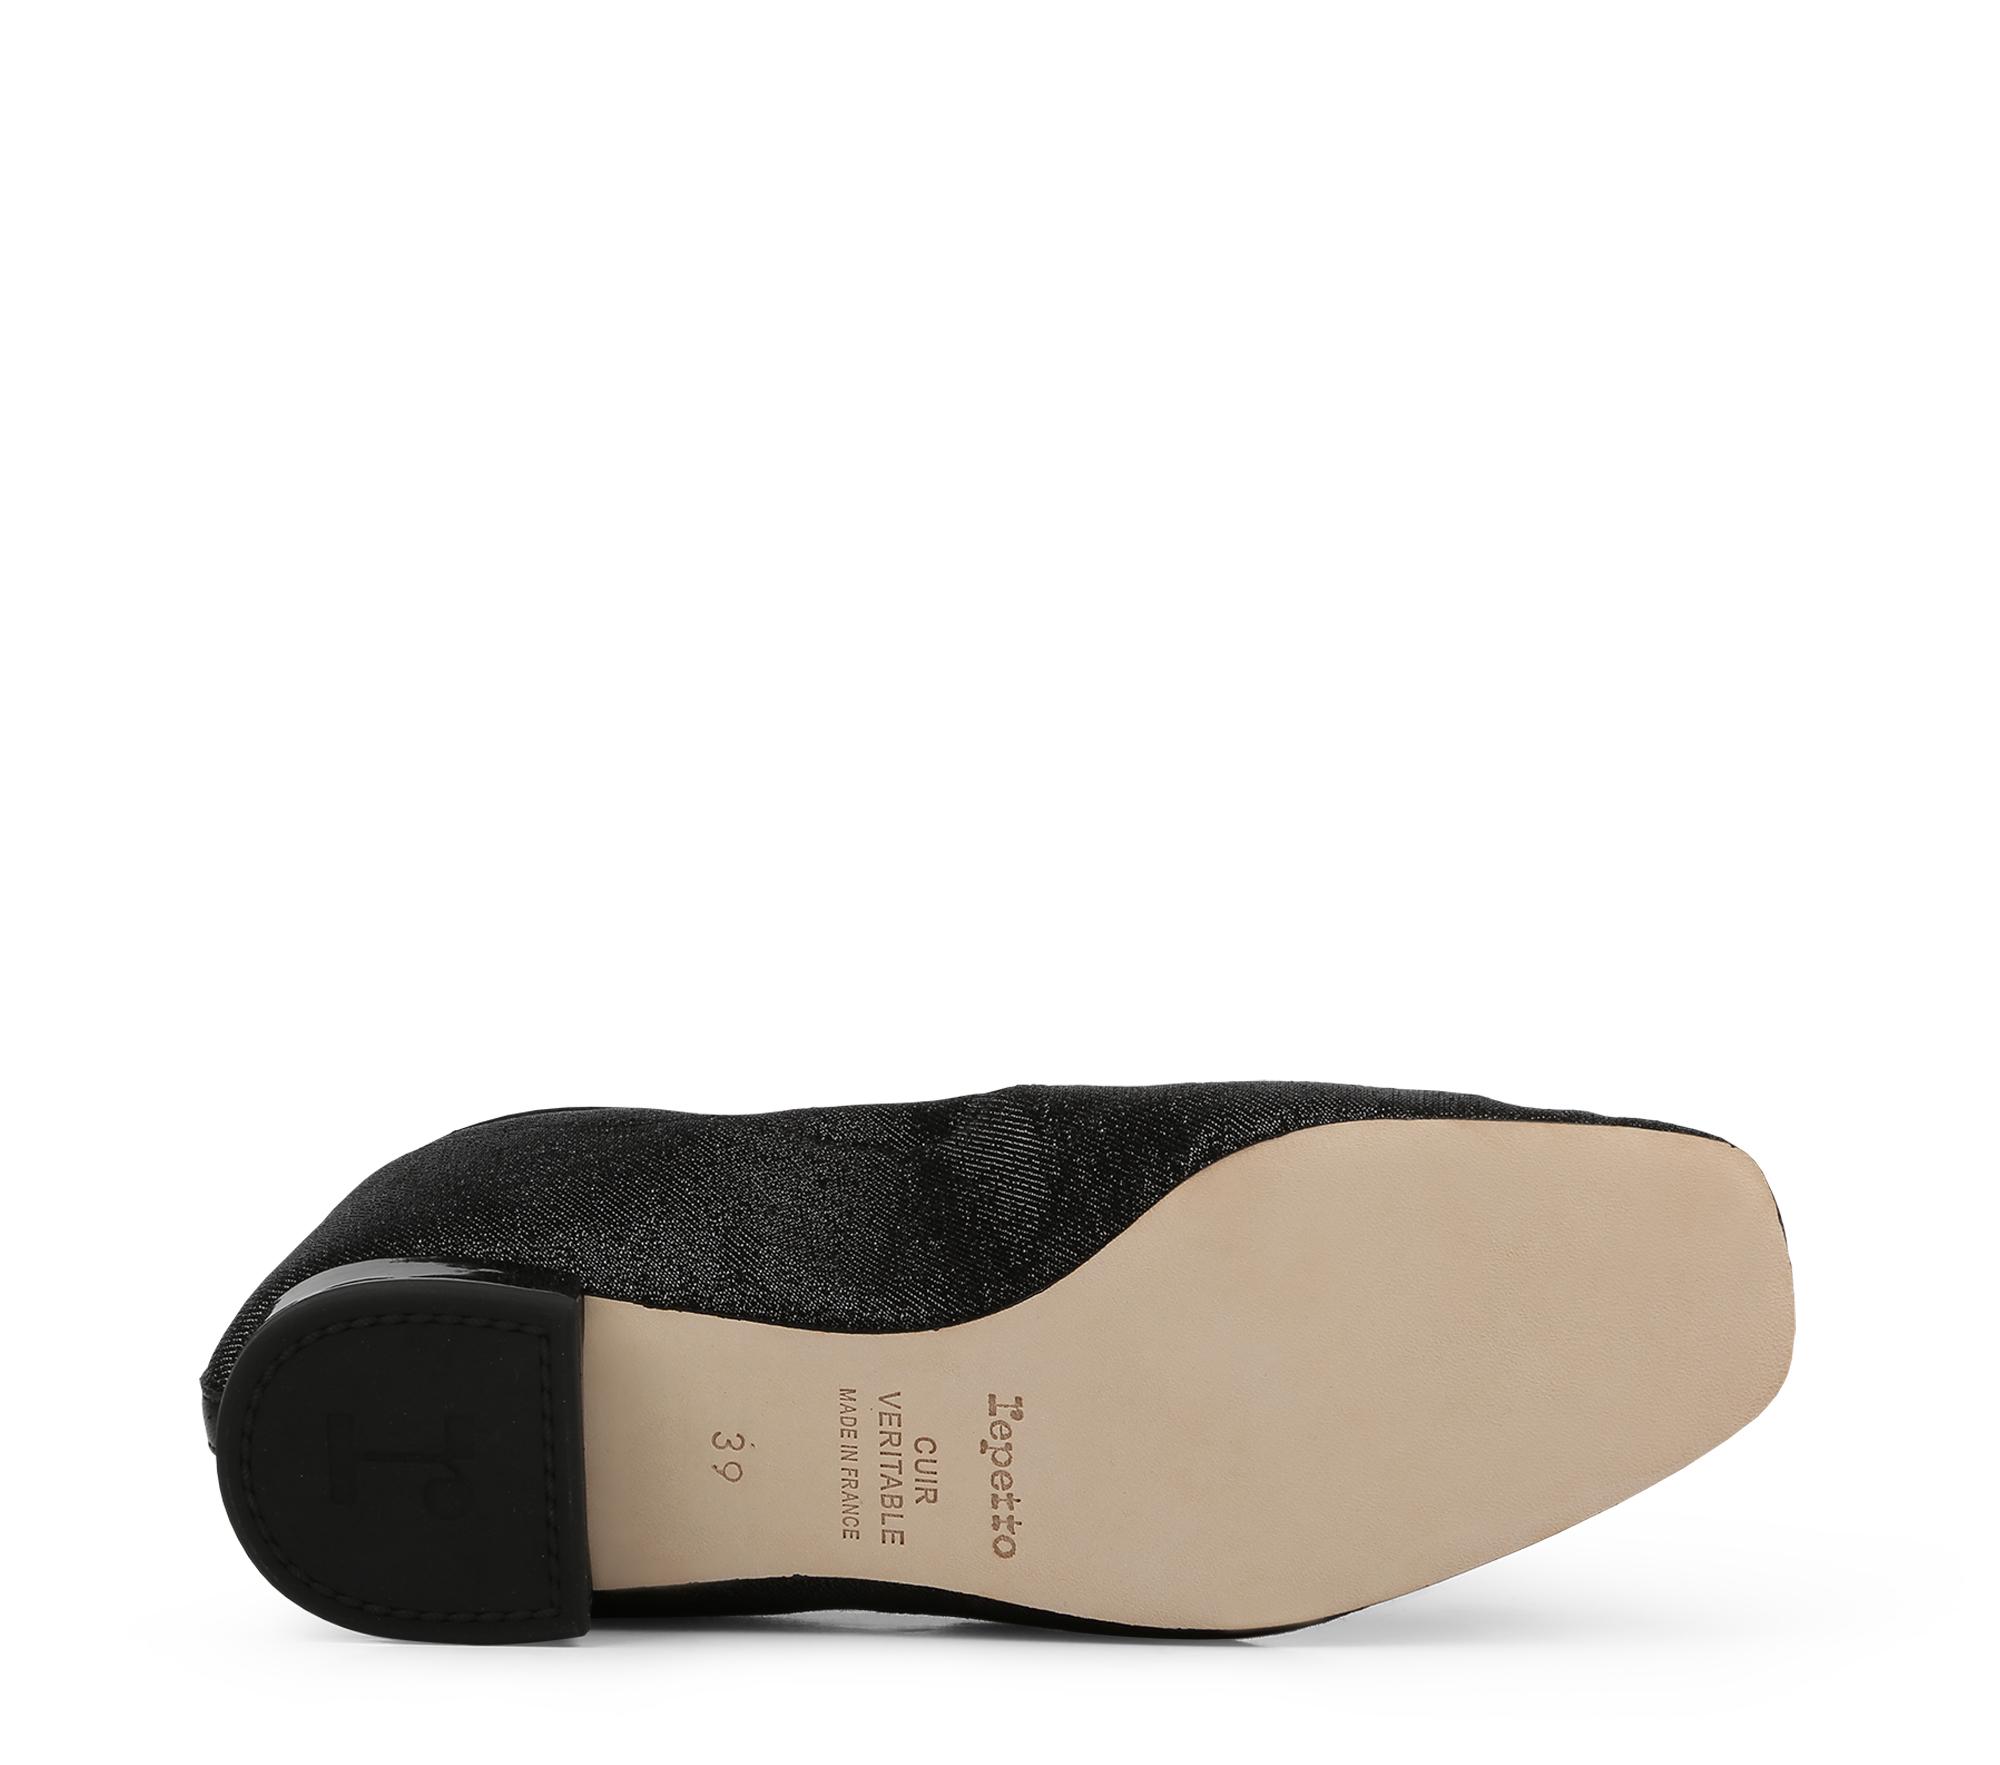 Marty toe slipper